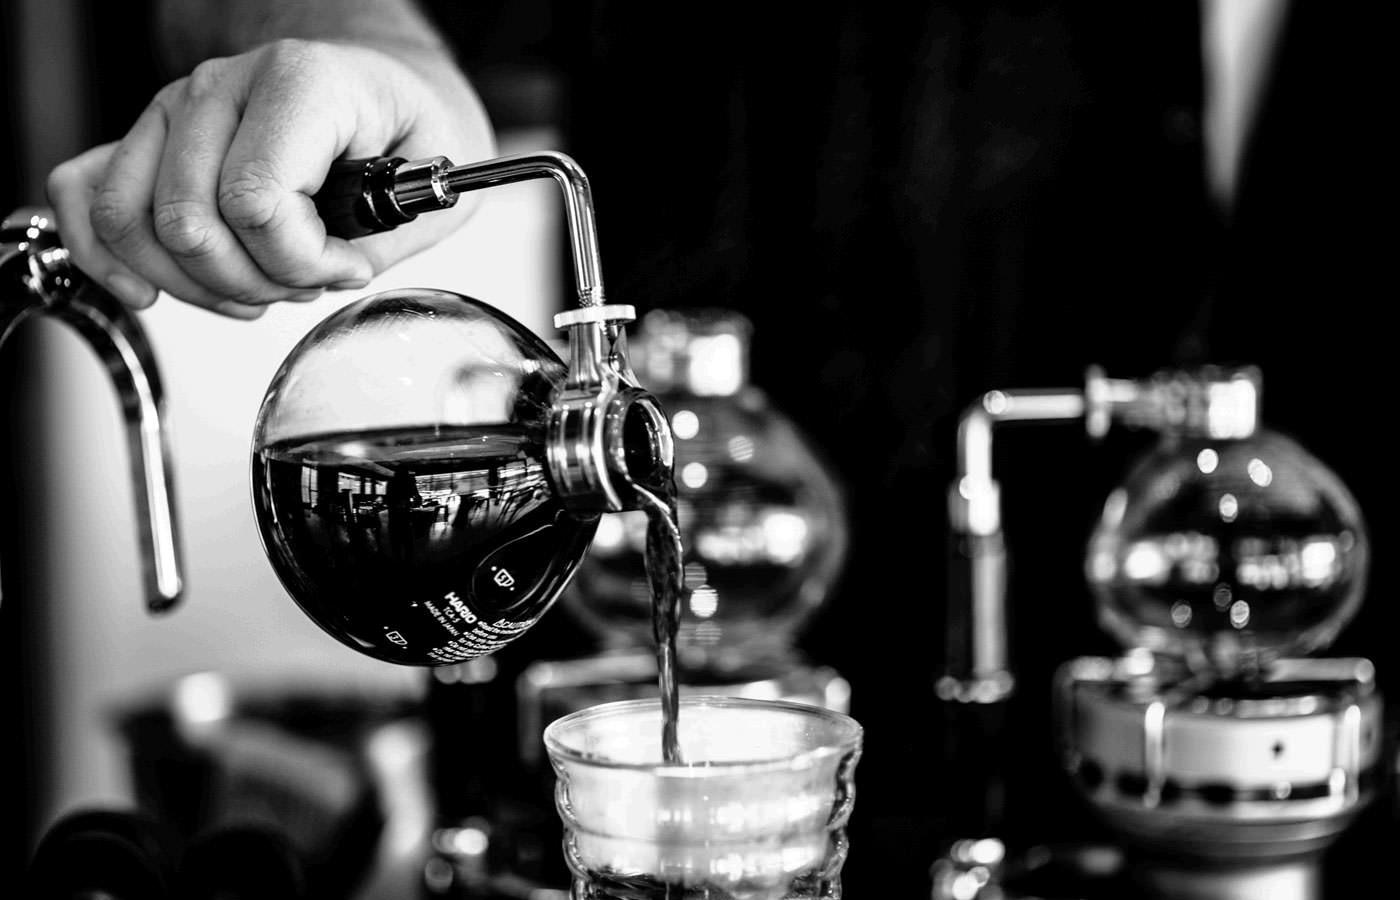 http://pixgood.com/siphon-coffee.html | pixgood - sifon kahve tarifi